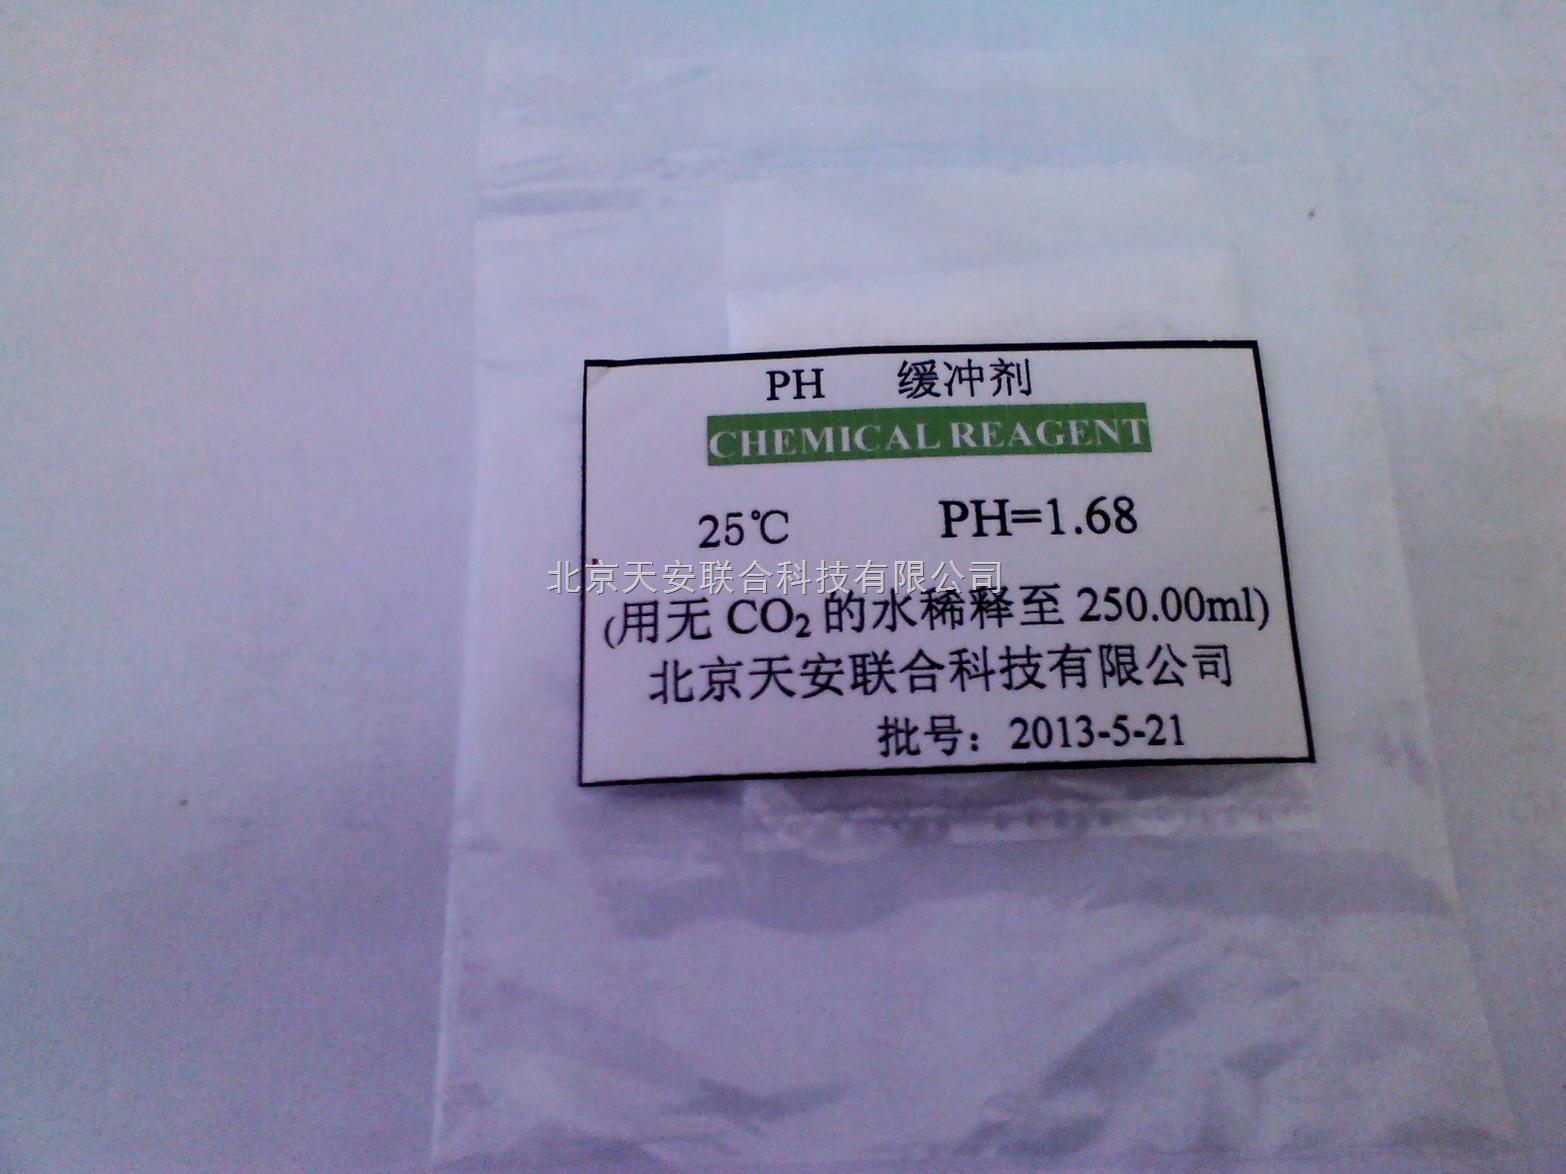 PH1.68 PH缓冲剂PH=1.68 PH校准液1.68